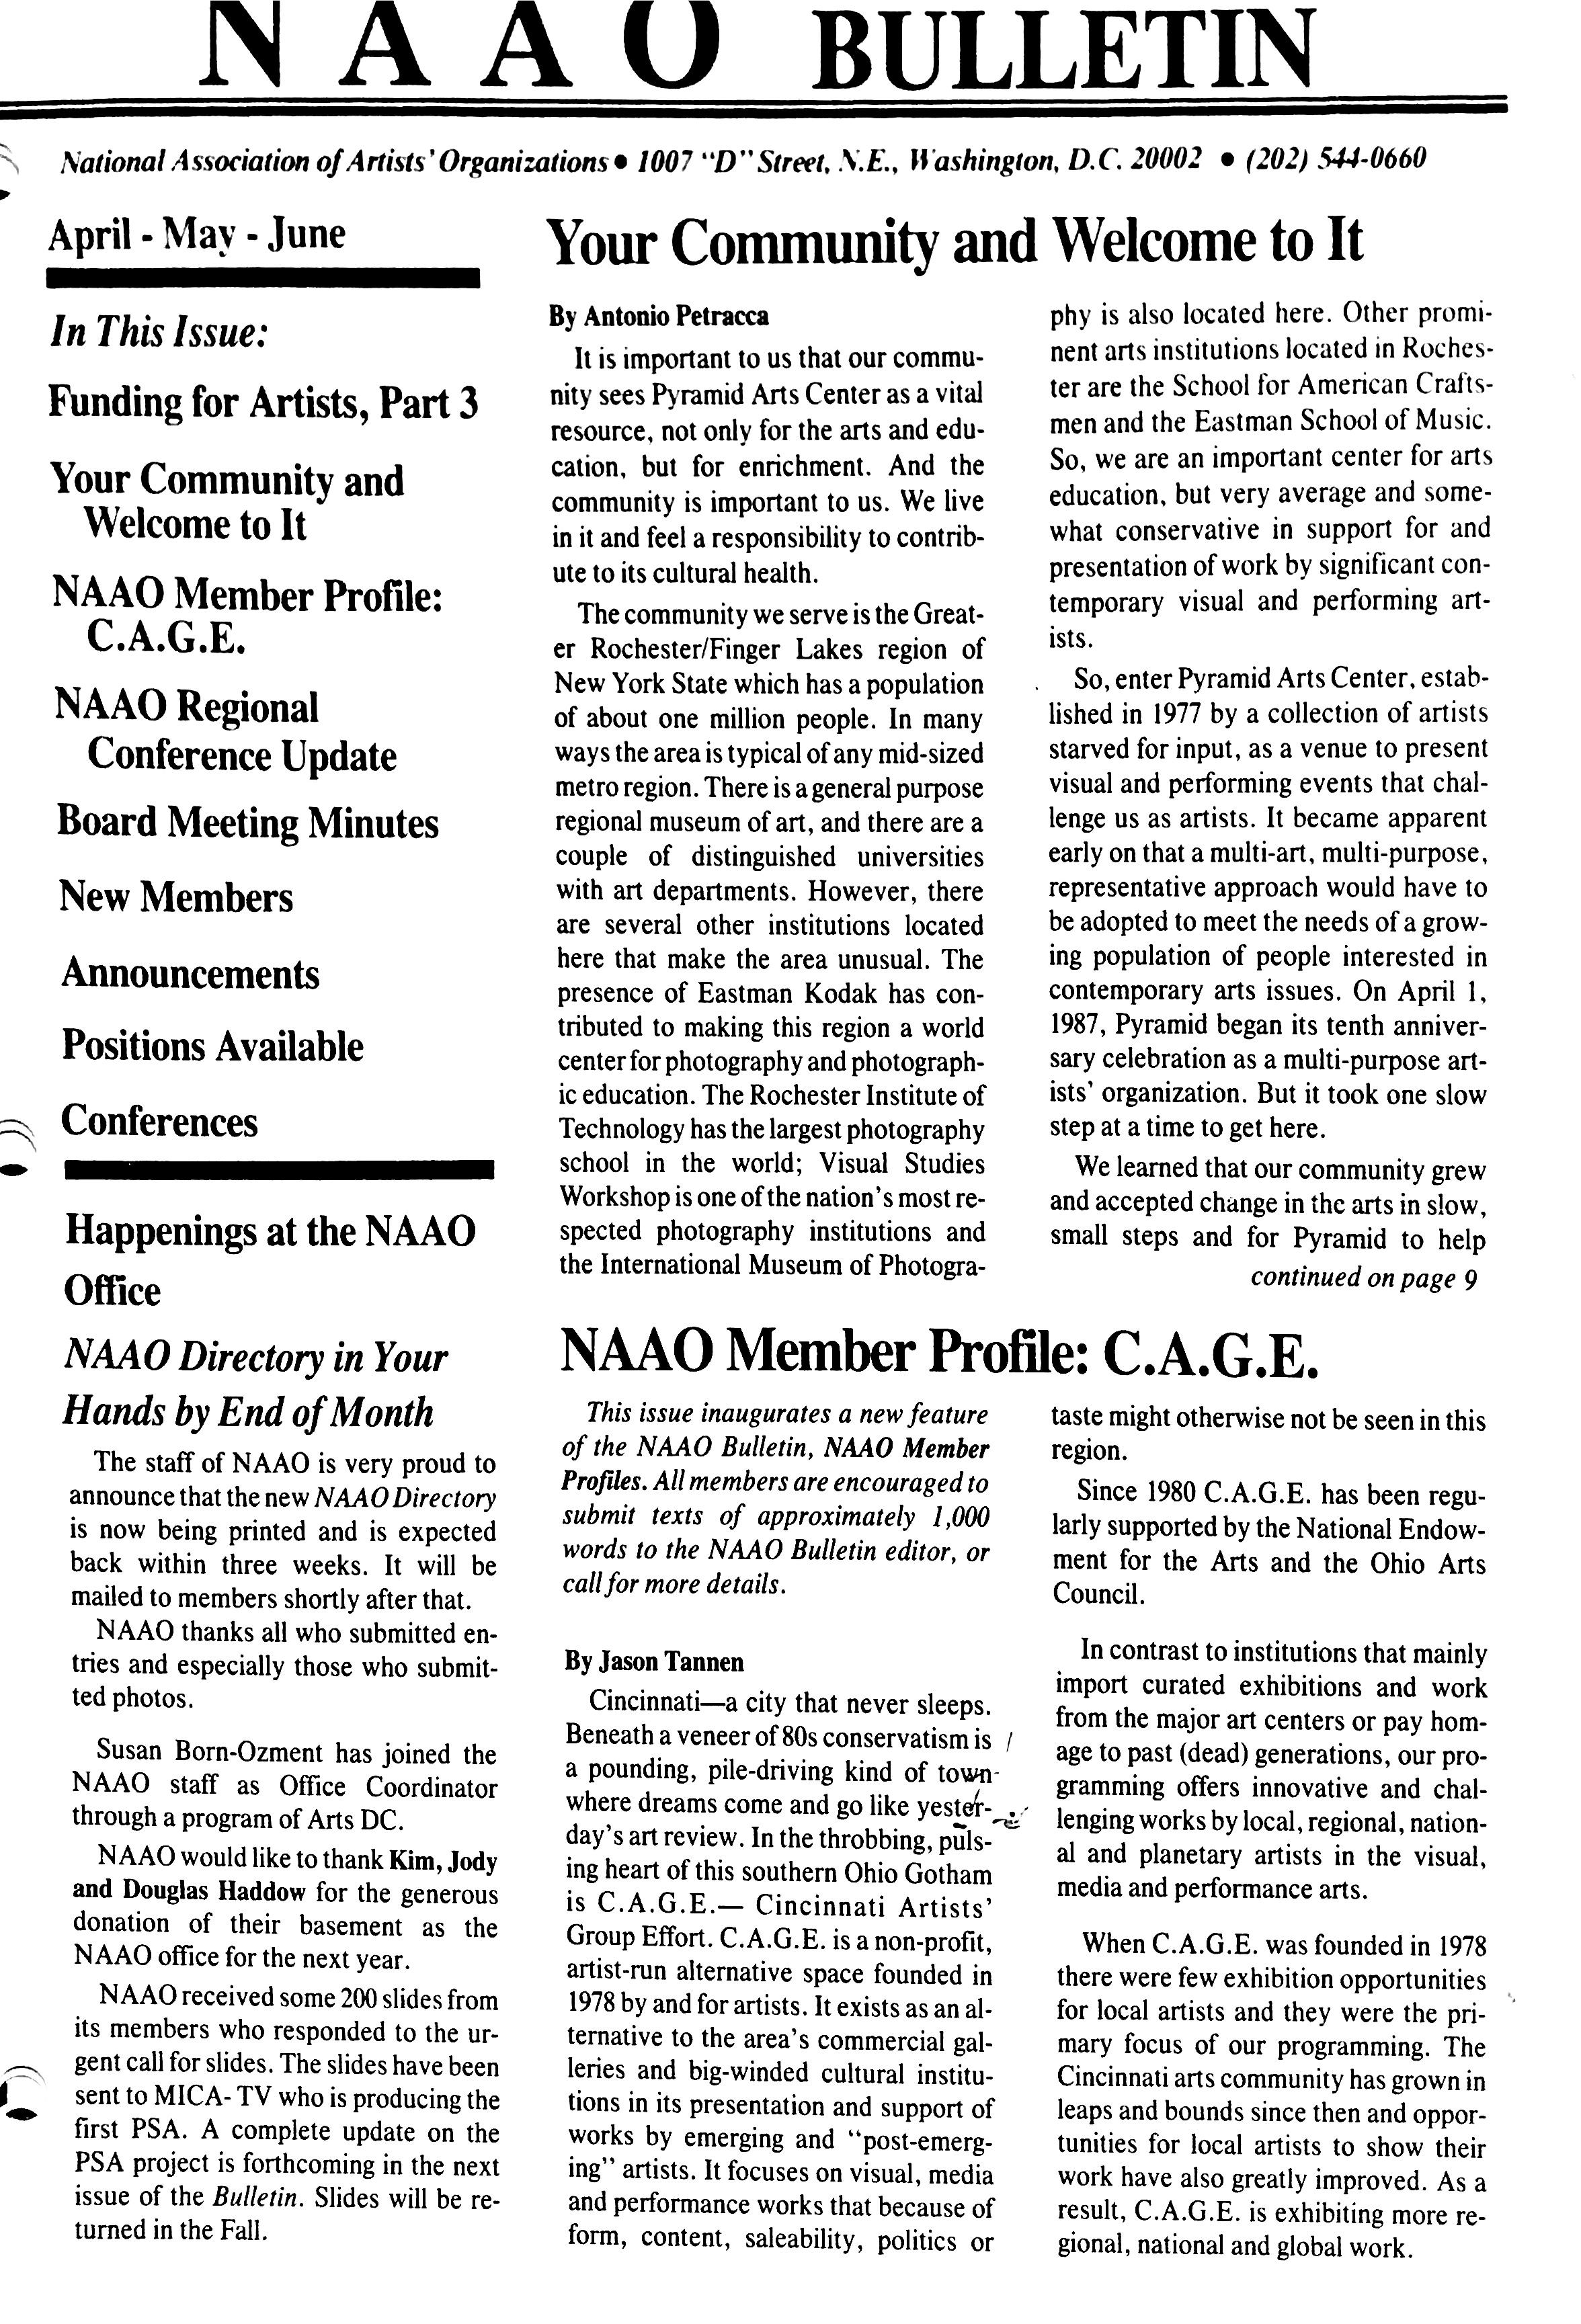 April-May-June 1987 - NAAO Bulletin Page 1.jpg